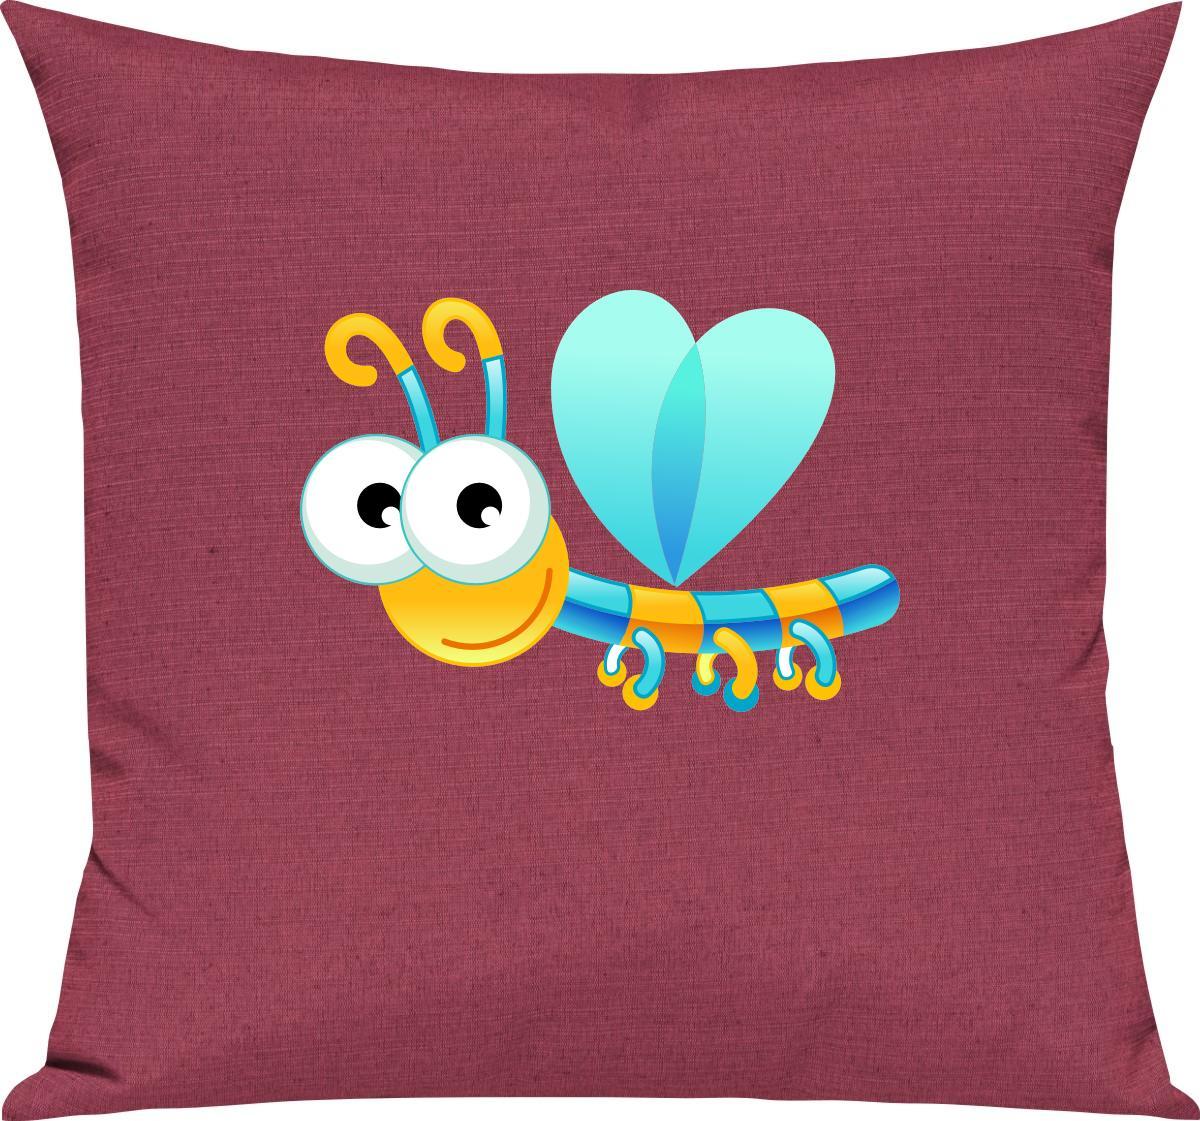 Indexbild 11 - Kinder Kissen, Libelle Insekt Tiere Tier Natur, Kuschelkissen Couch Deko,